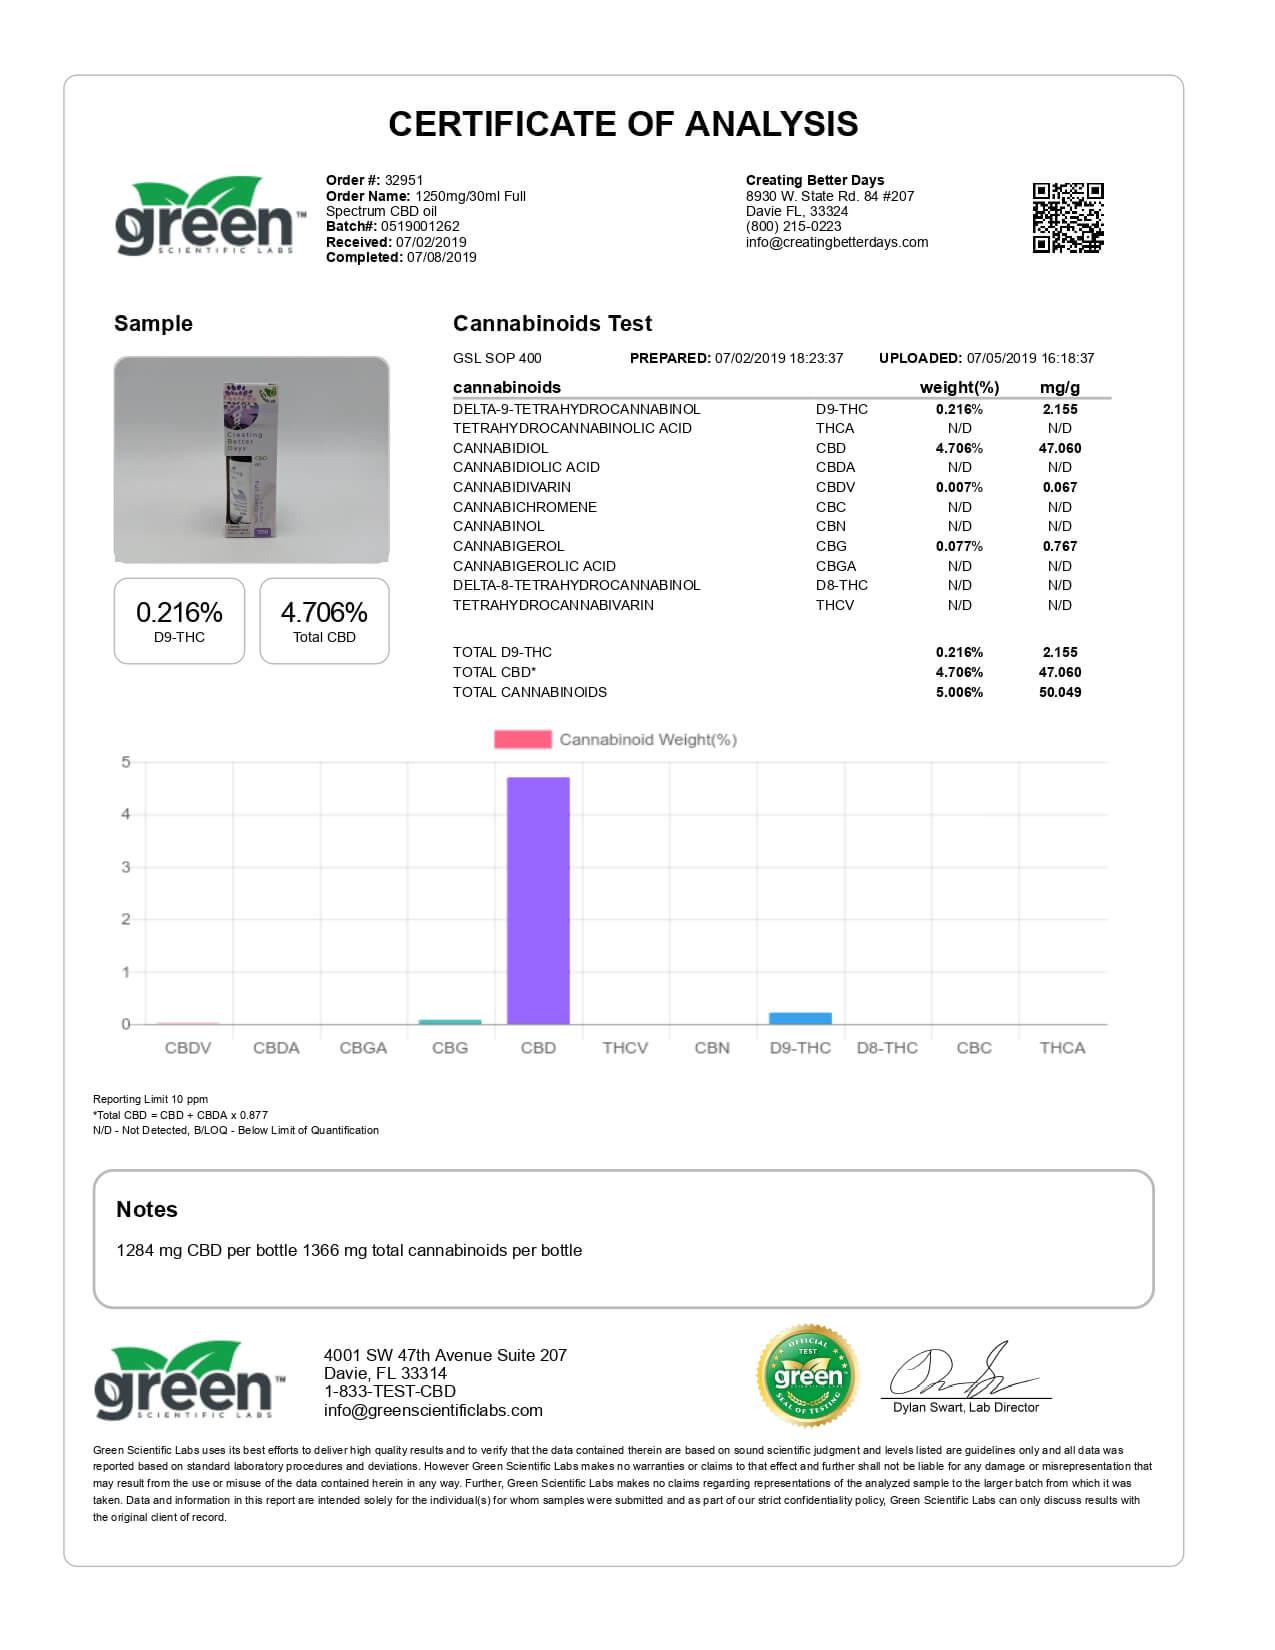 Creating Better Days CBD Tincture Full Spectrum Oil 1250mg Lab Report